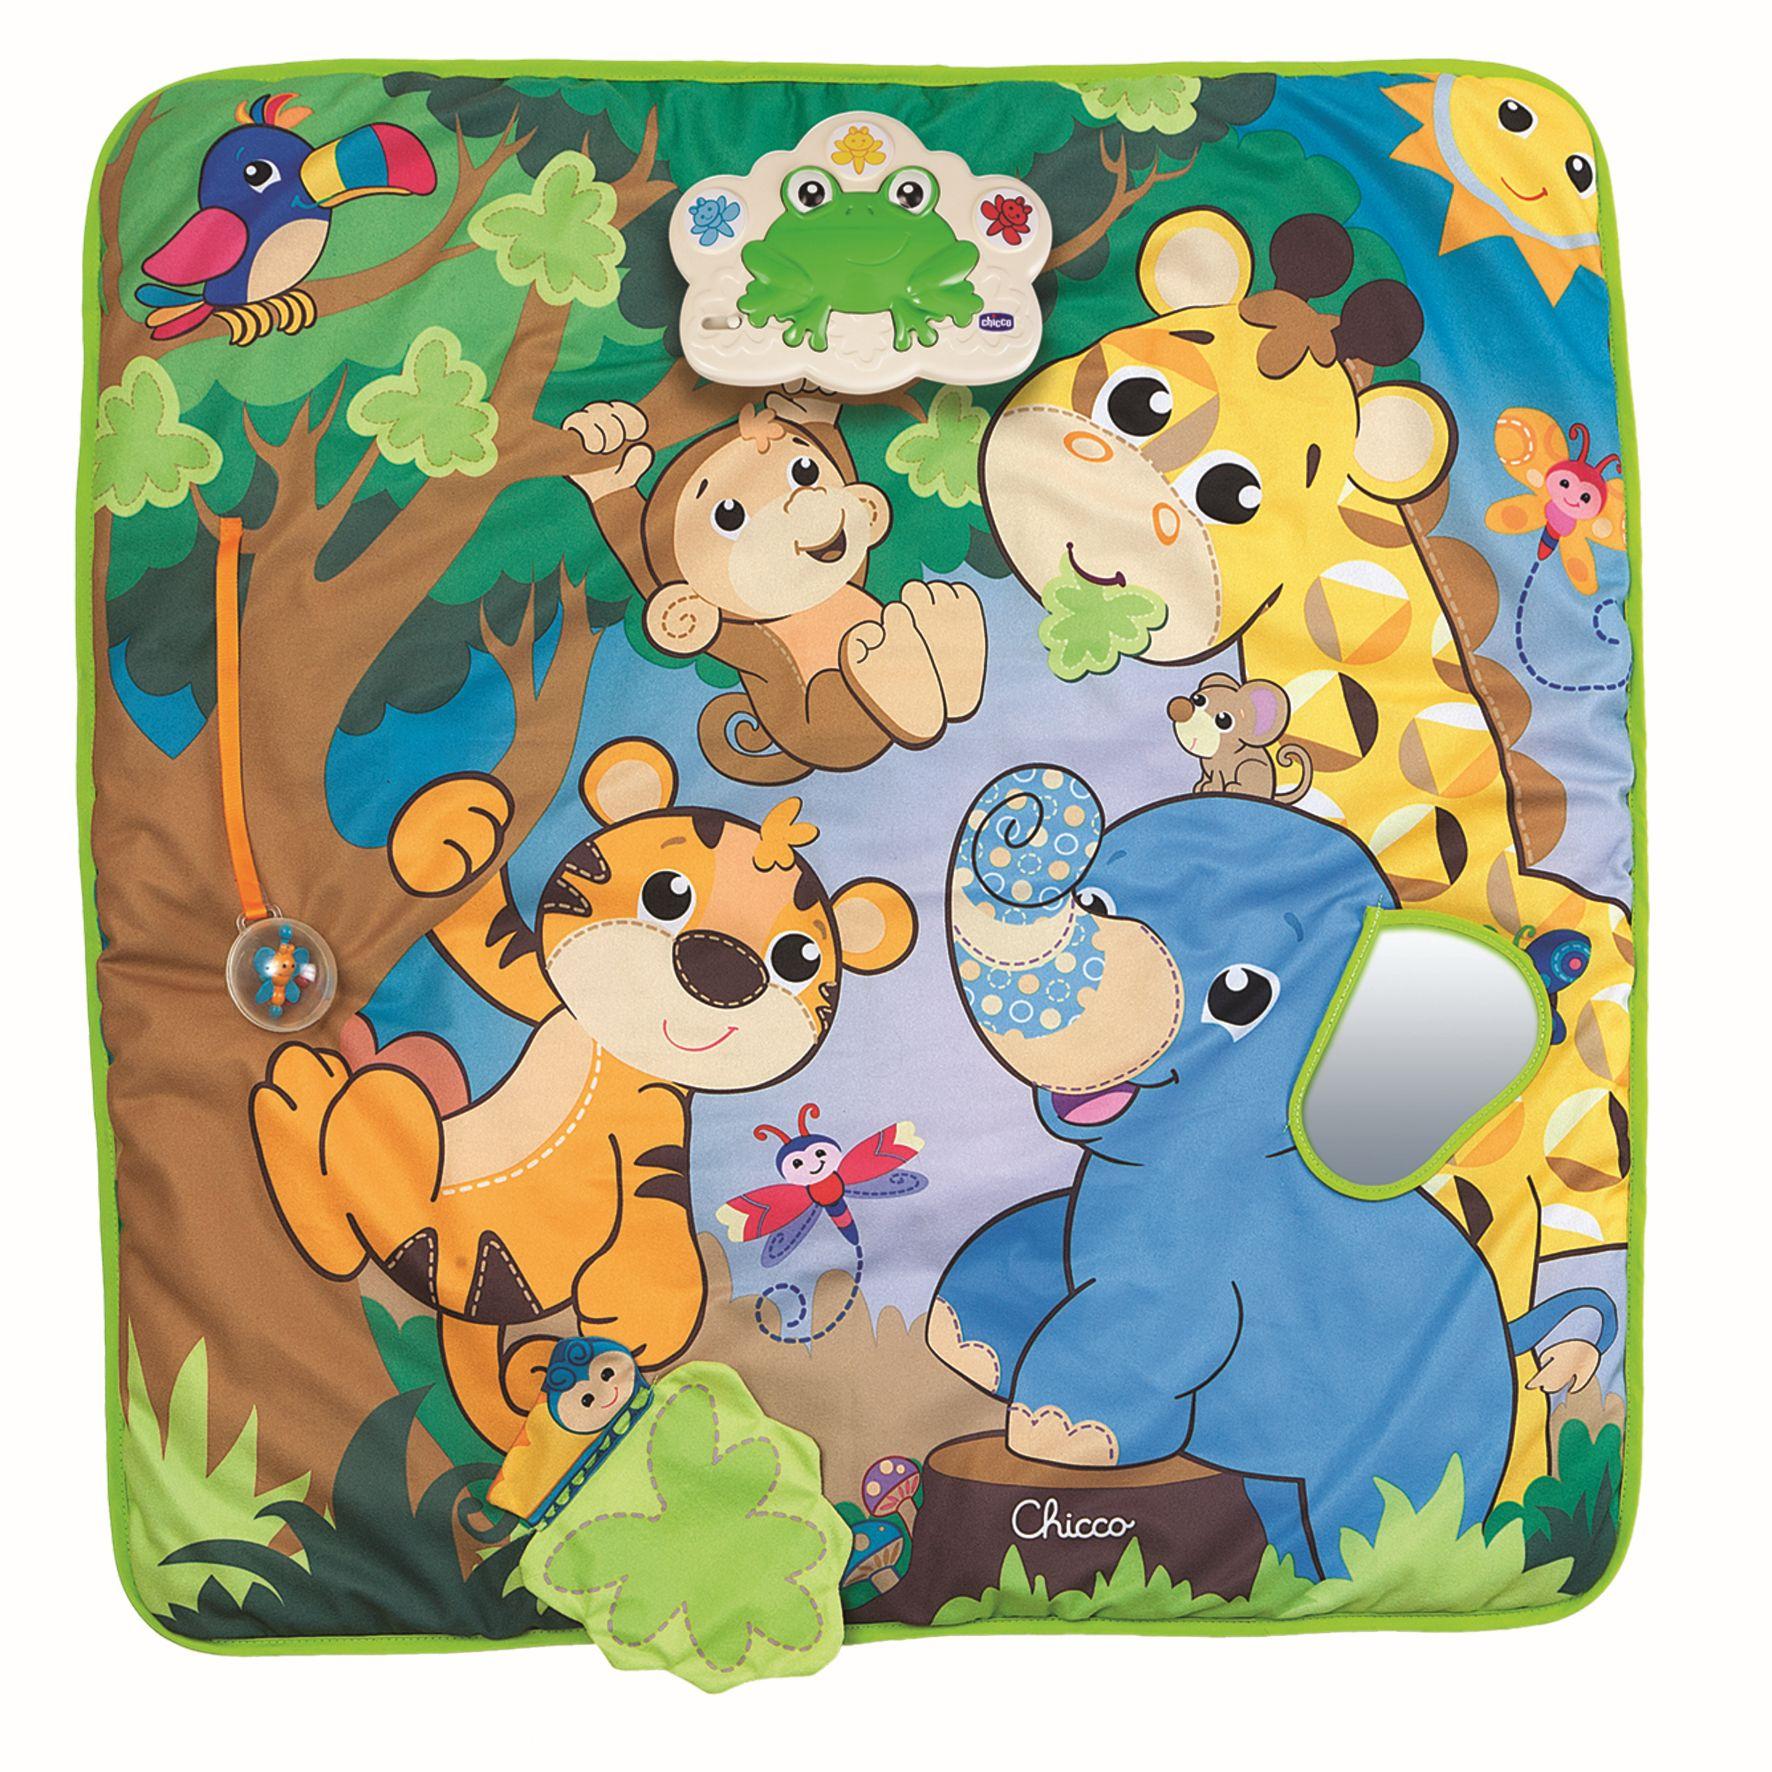 Chicco Play Mat Musical Jungle Buy At Kidsroom Toys